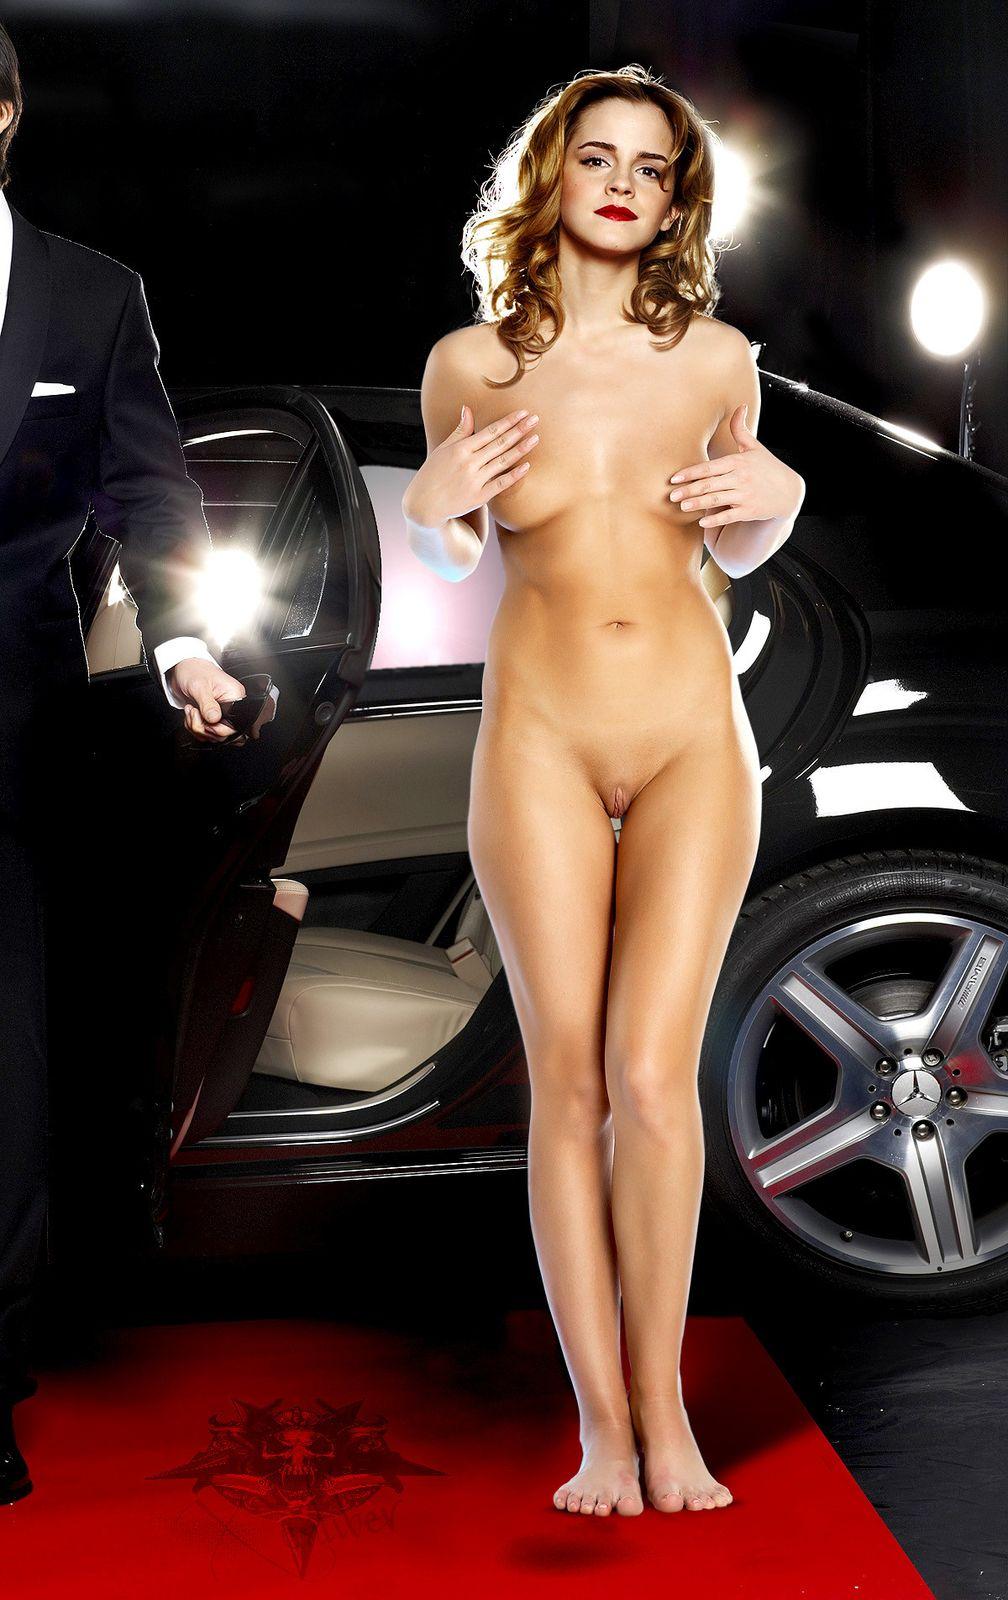 Nude Xxx Porn Pics Stunning emma watson nude naked xxx sex photo collection [81 pics]